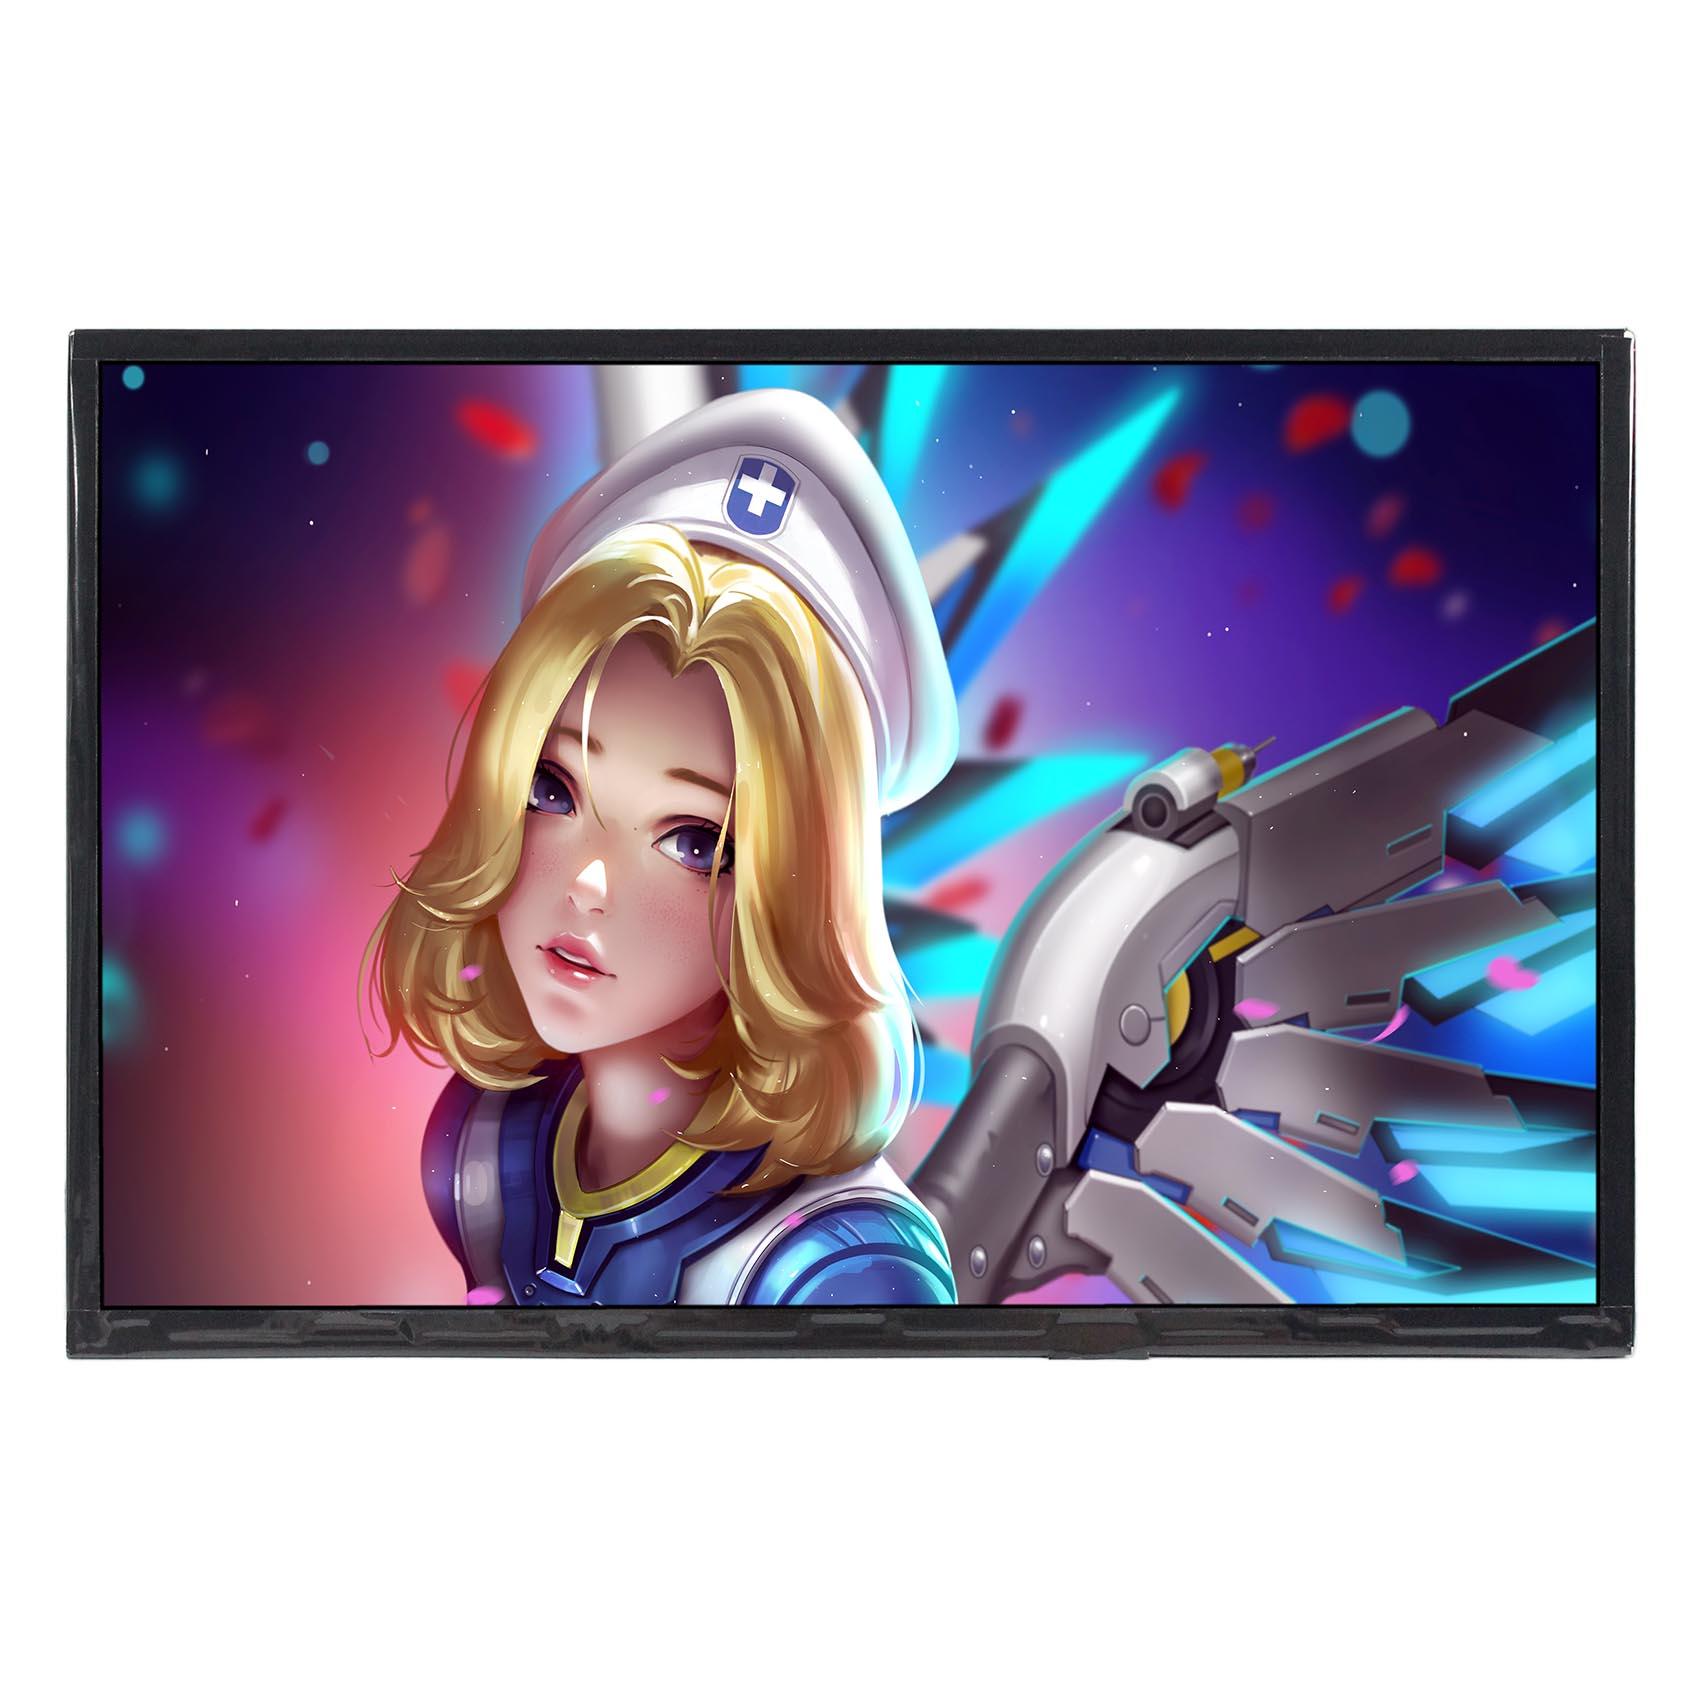 Unterhaltungselektronik 10,1 Zoll 1920x1200 Lcd Bildschirm B101uan01 C